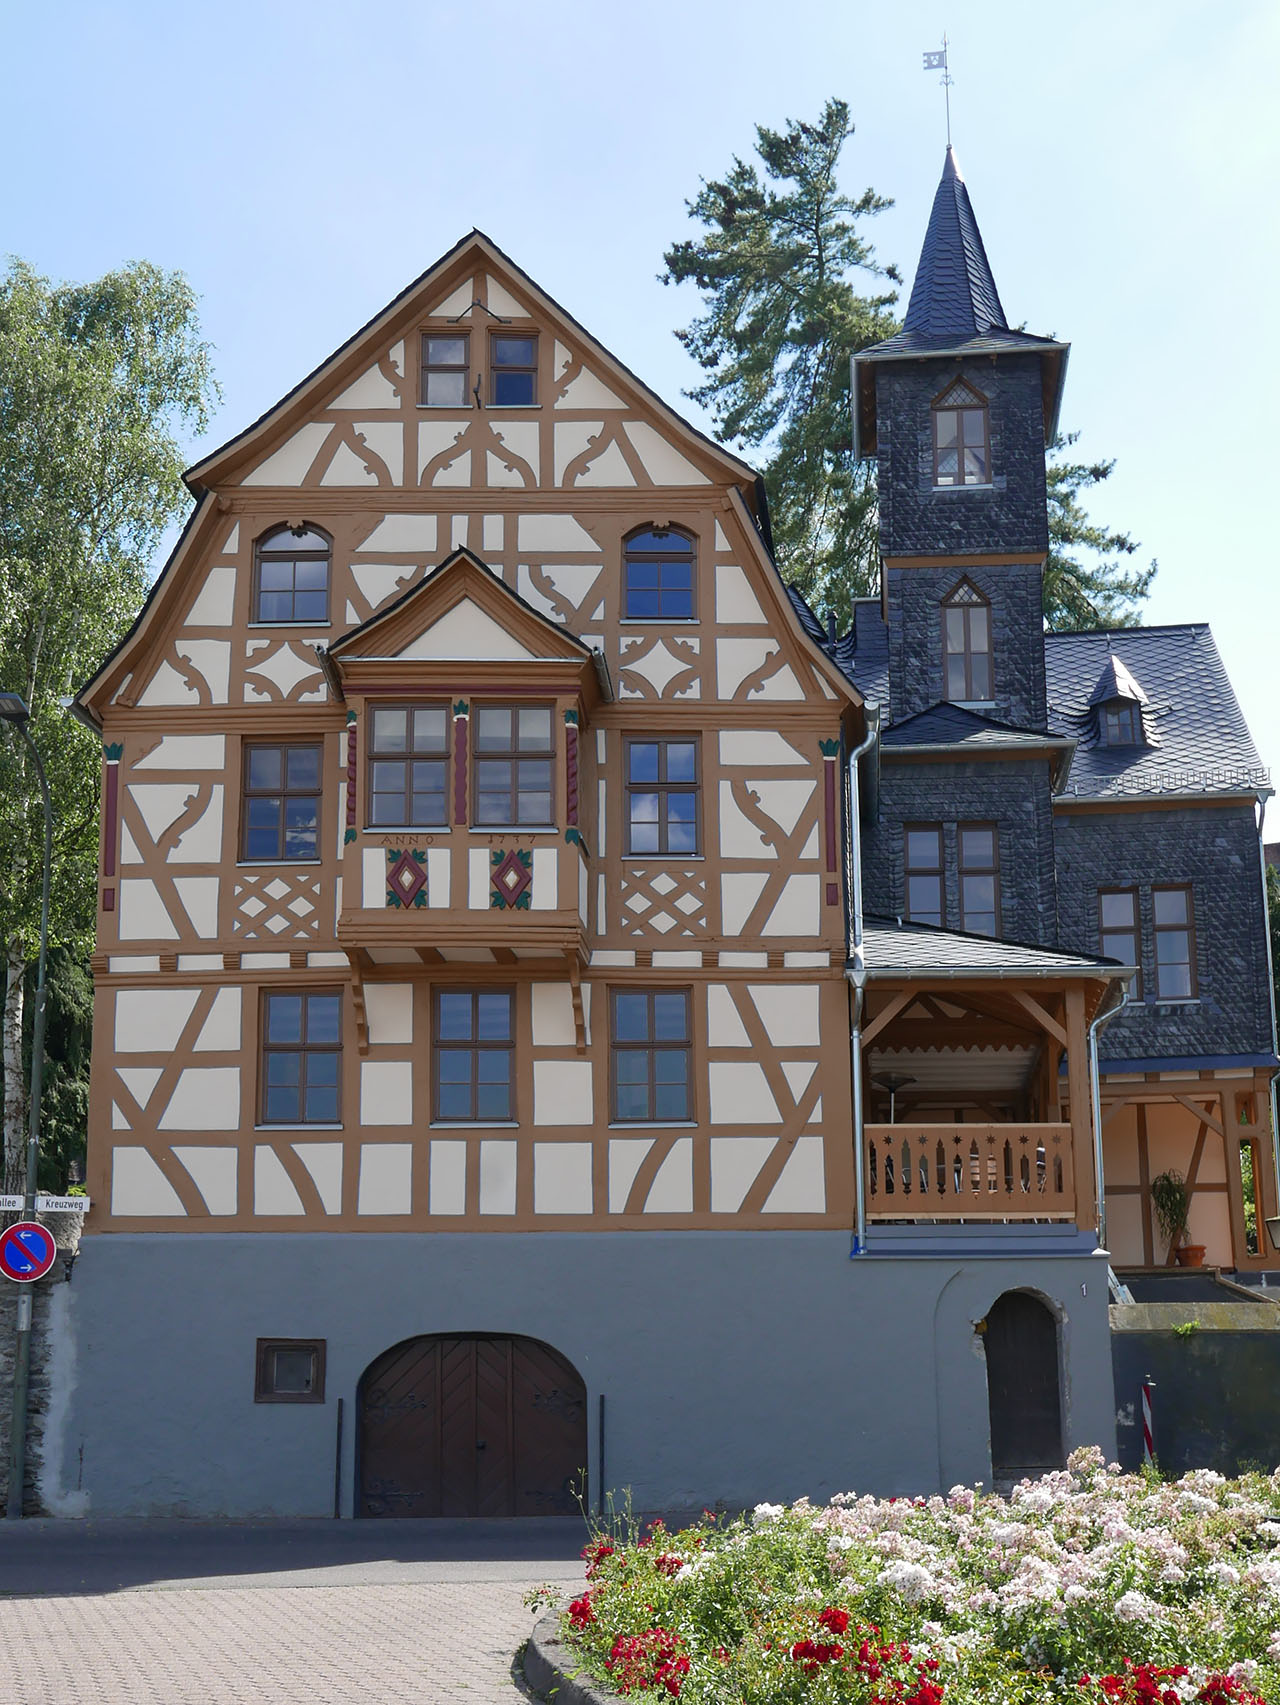 Cara Sharratt Travel - Boppard, Germany